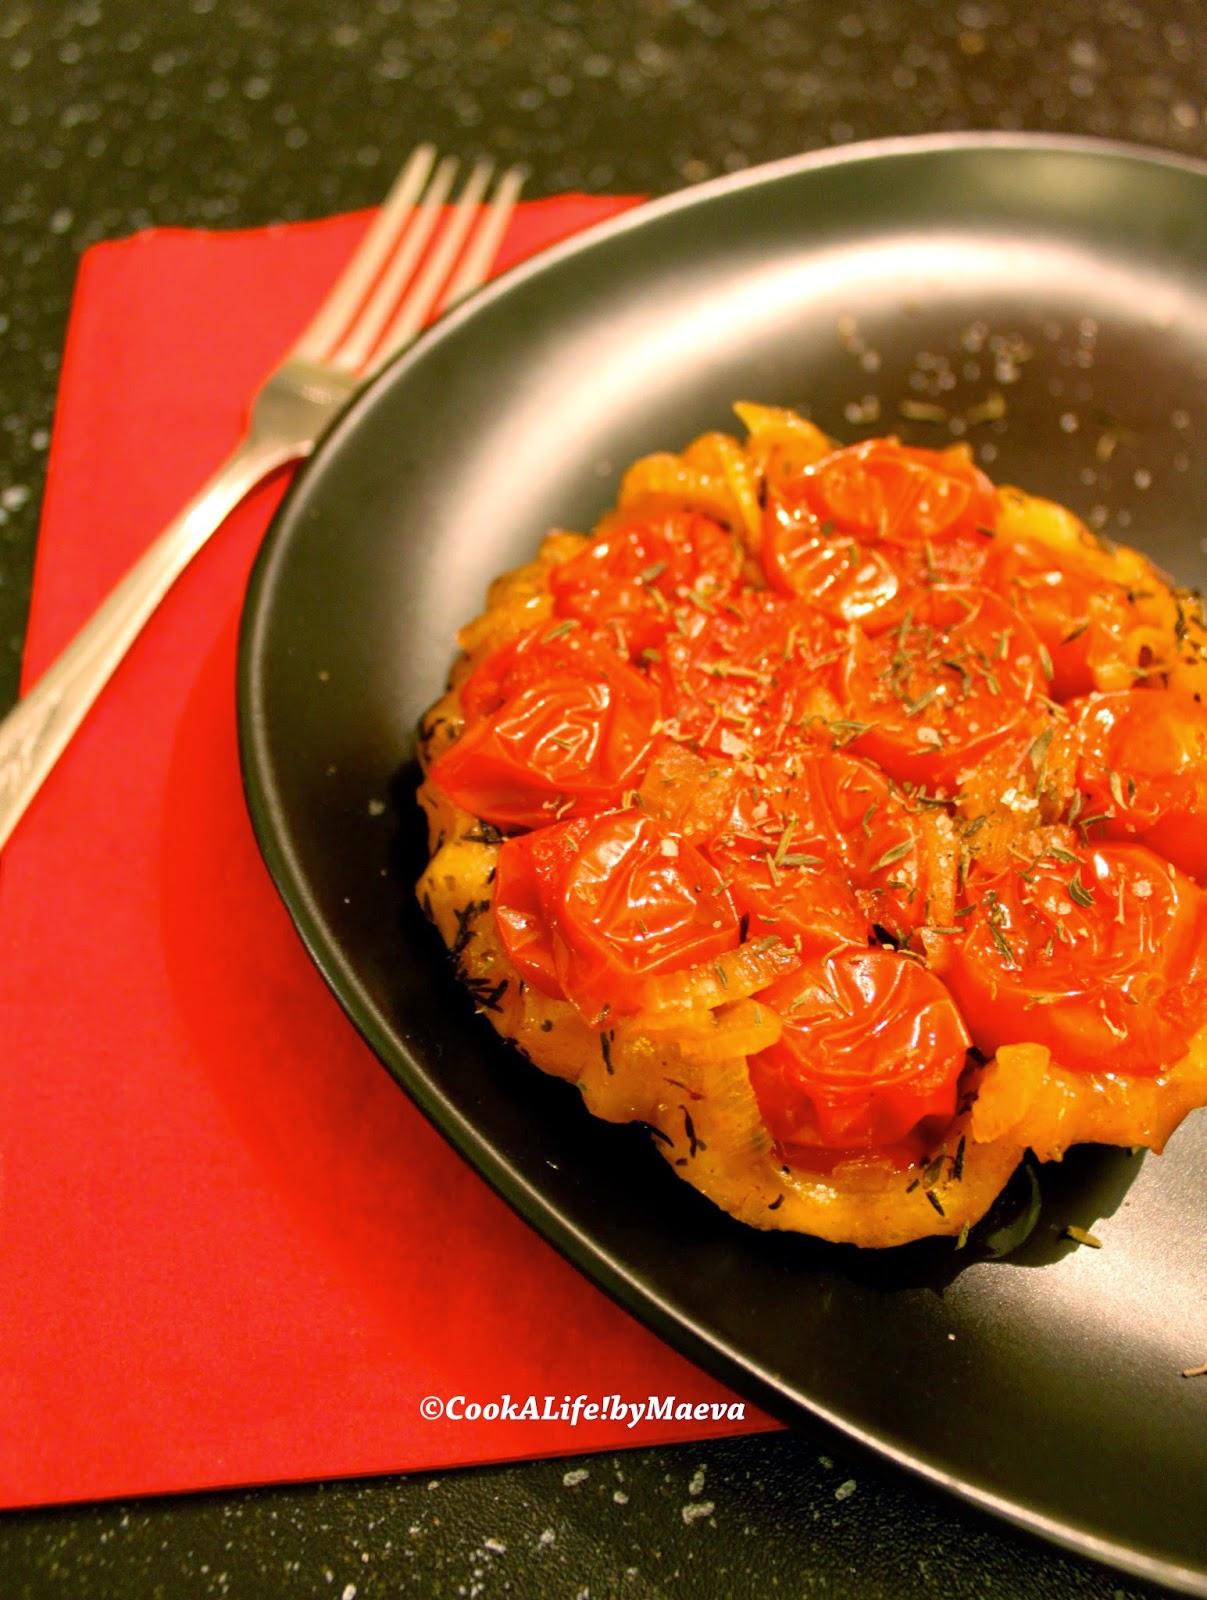 Cook a life by maeva petites tatins de tomates cerises - Accompagnement salade verte ...